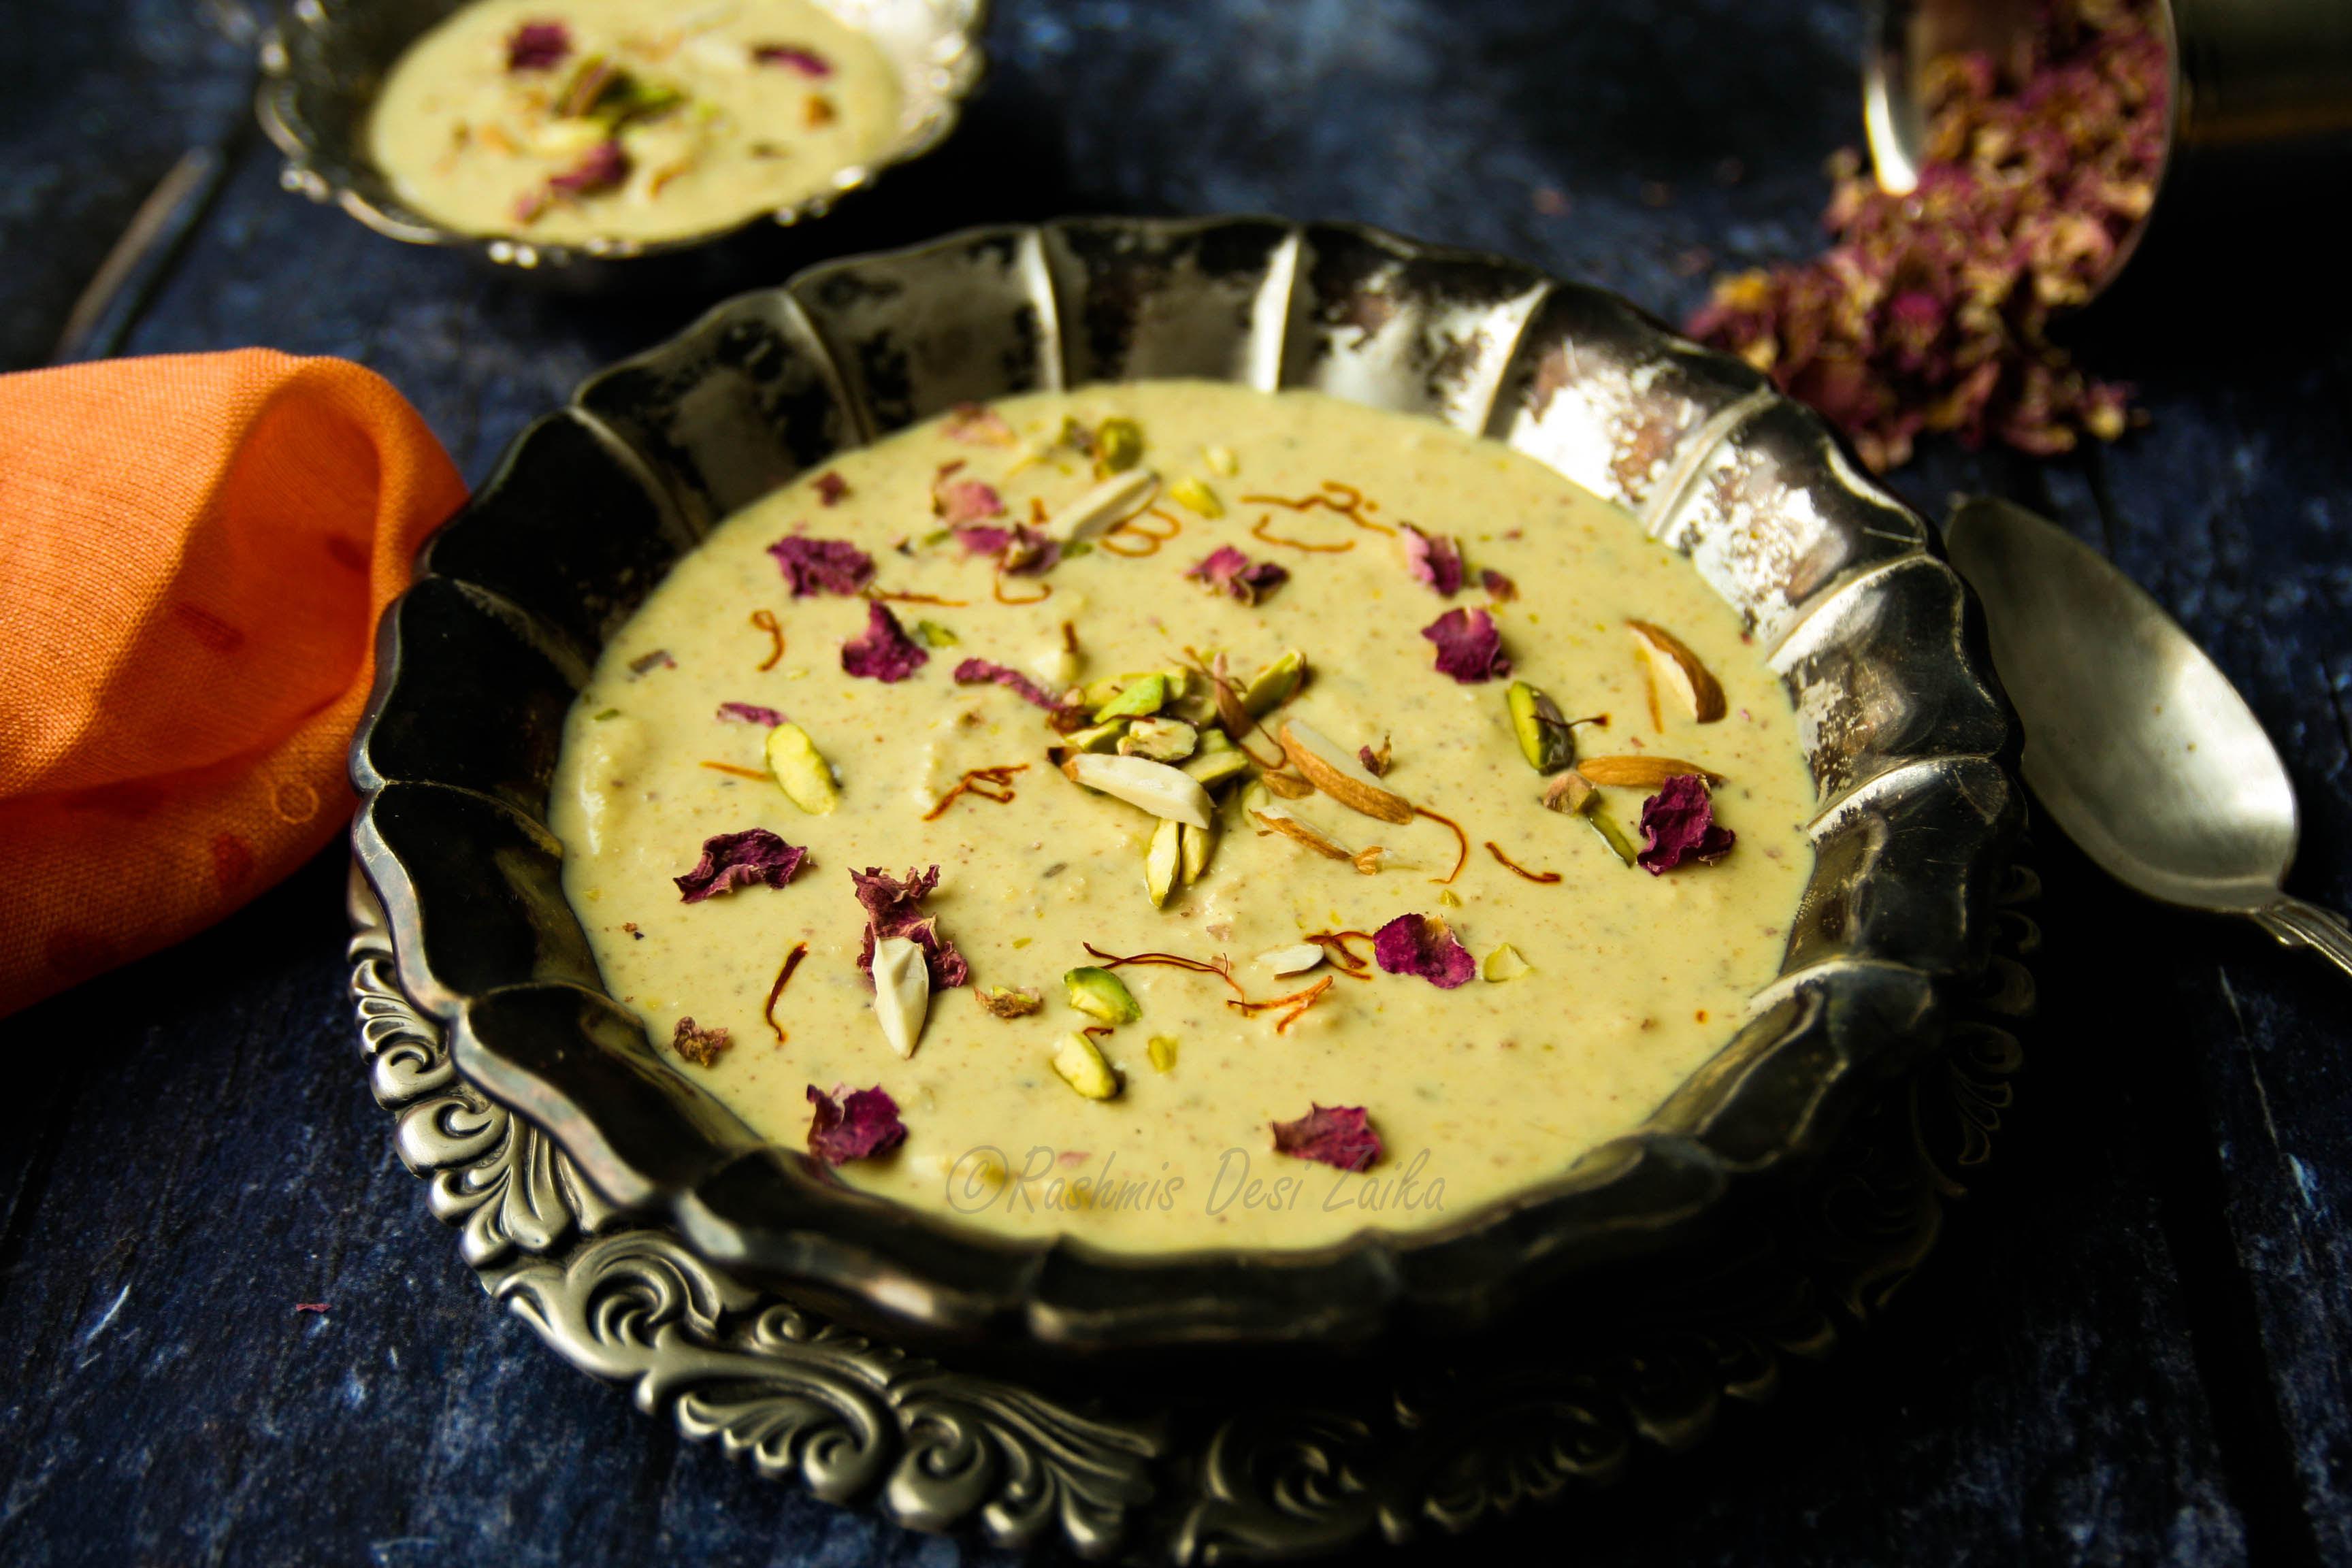 Thandai Spiced Rabri-Spiced Thickened Milk